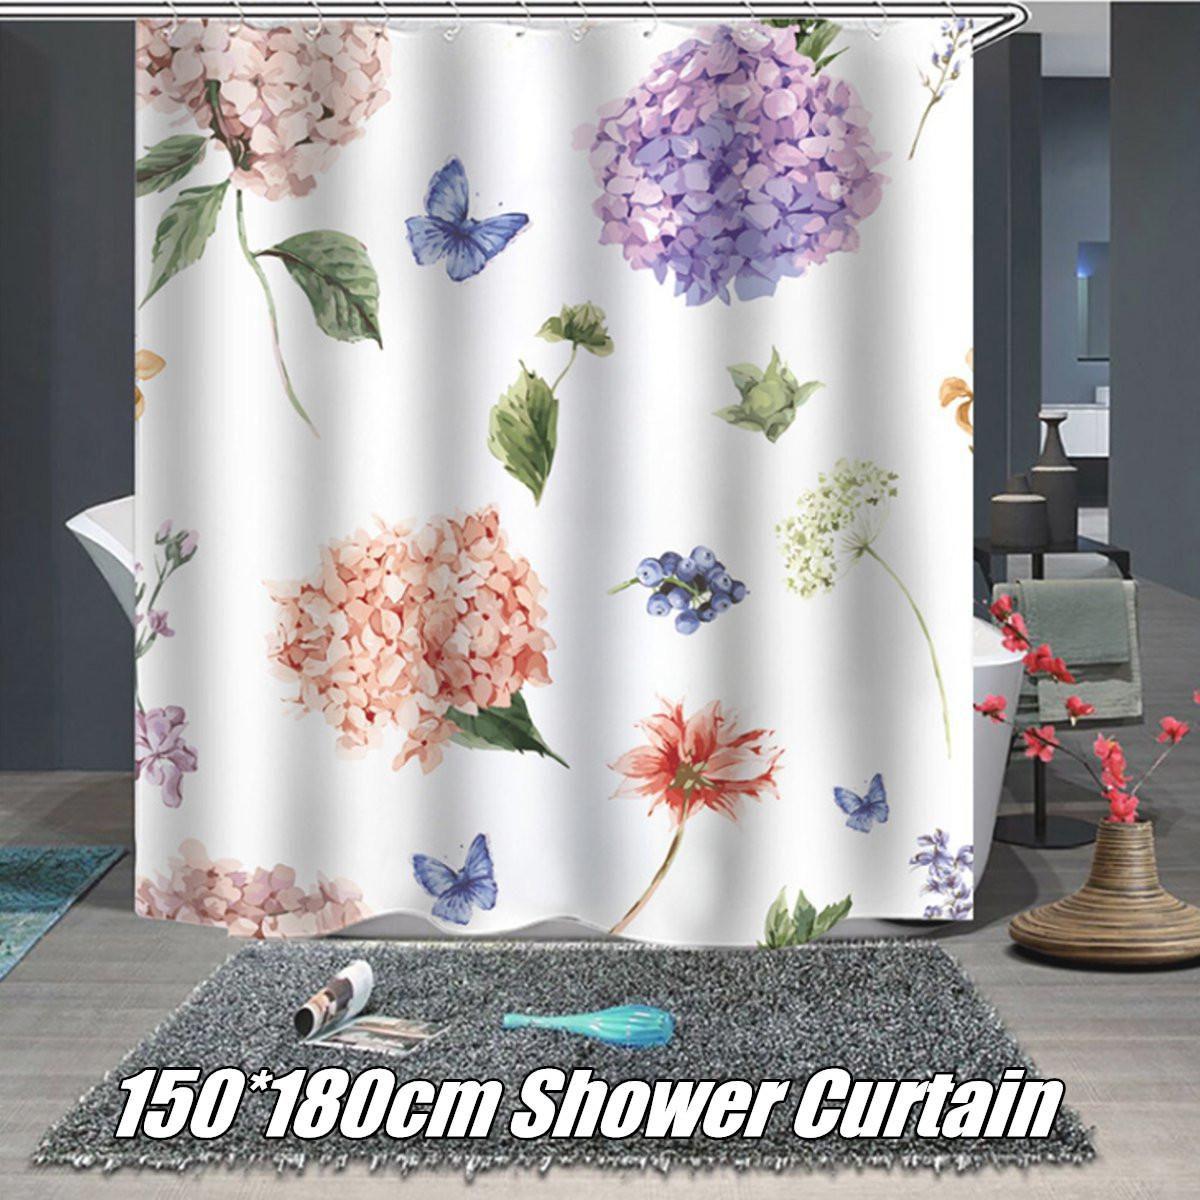 Buy 1 8x1 5m Waterproof Fabric Shower Curtain Bathroom Decor